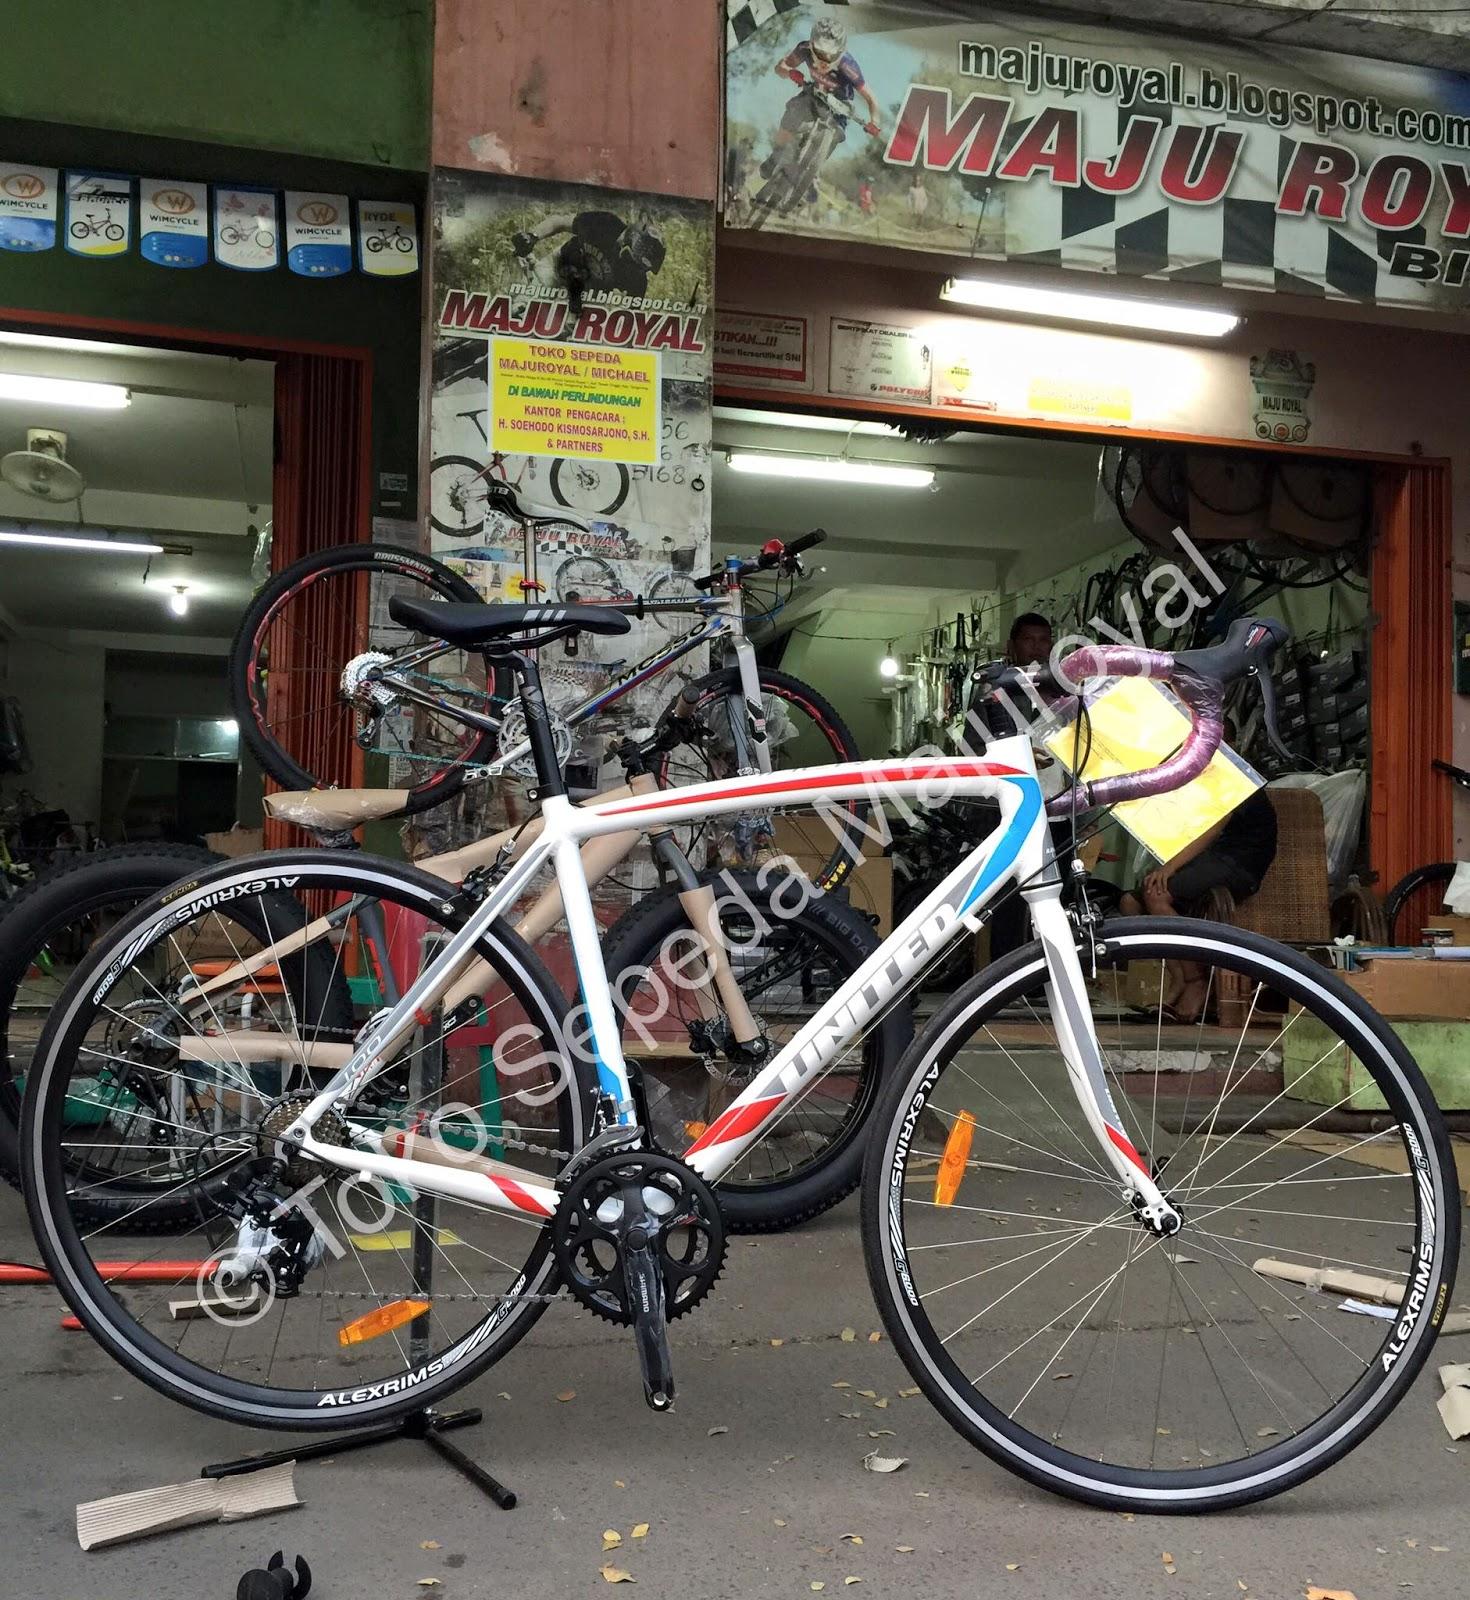 Toko Sepeda Online Majuroyal Sepeda Balap is Roadbike